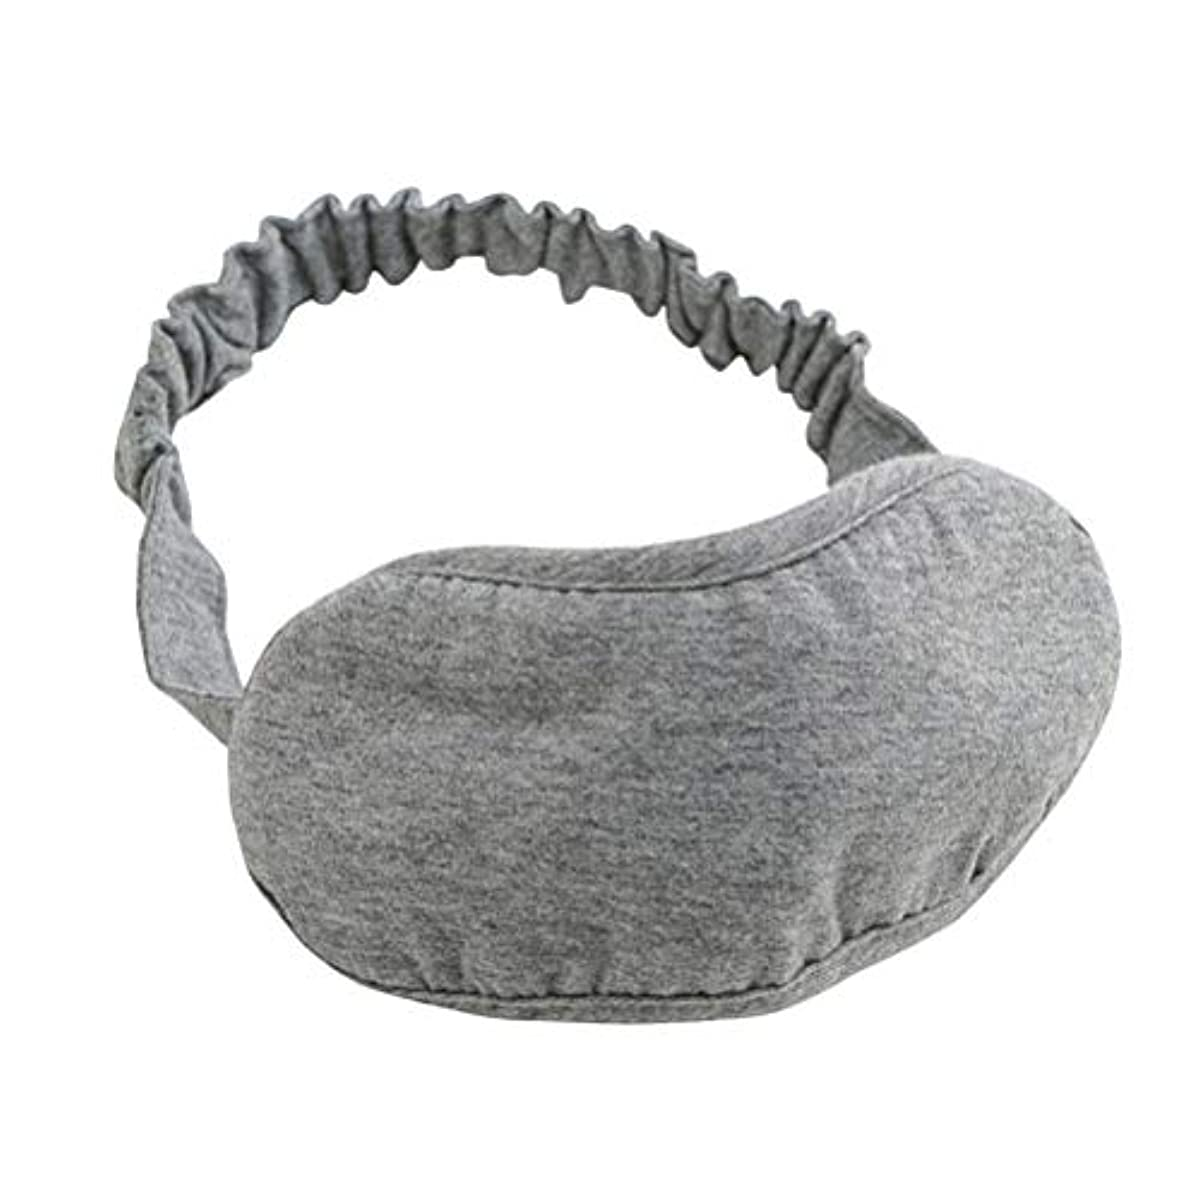 SUPVOX 睡眠マスクコットンアイマスク厚手の目隠しアイカバー女性のための子供たちの子供ホームベッド旅行のフライトカーキャンプオフィス使用(グレー)